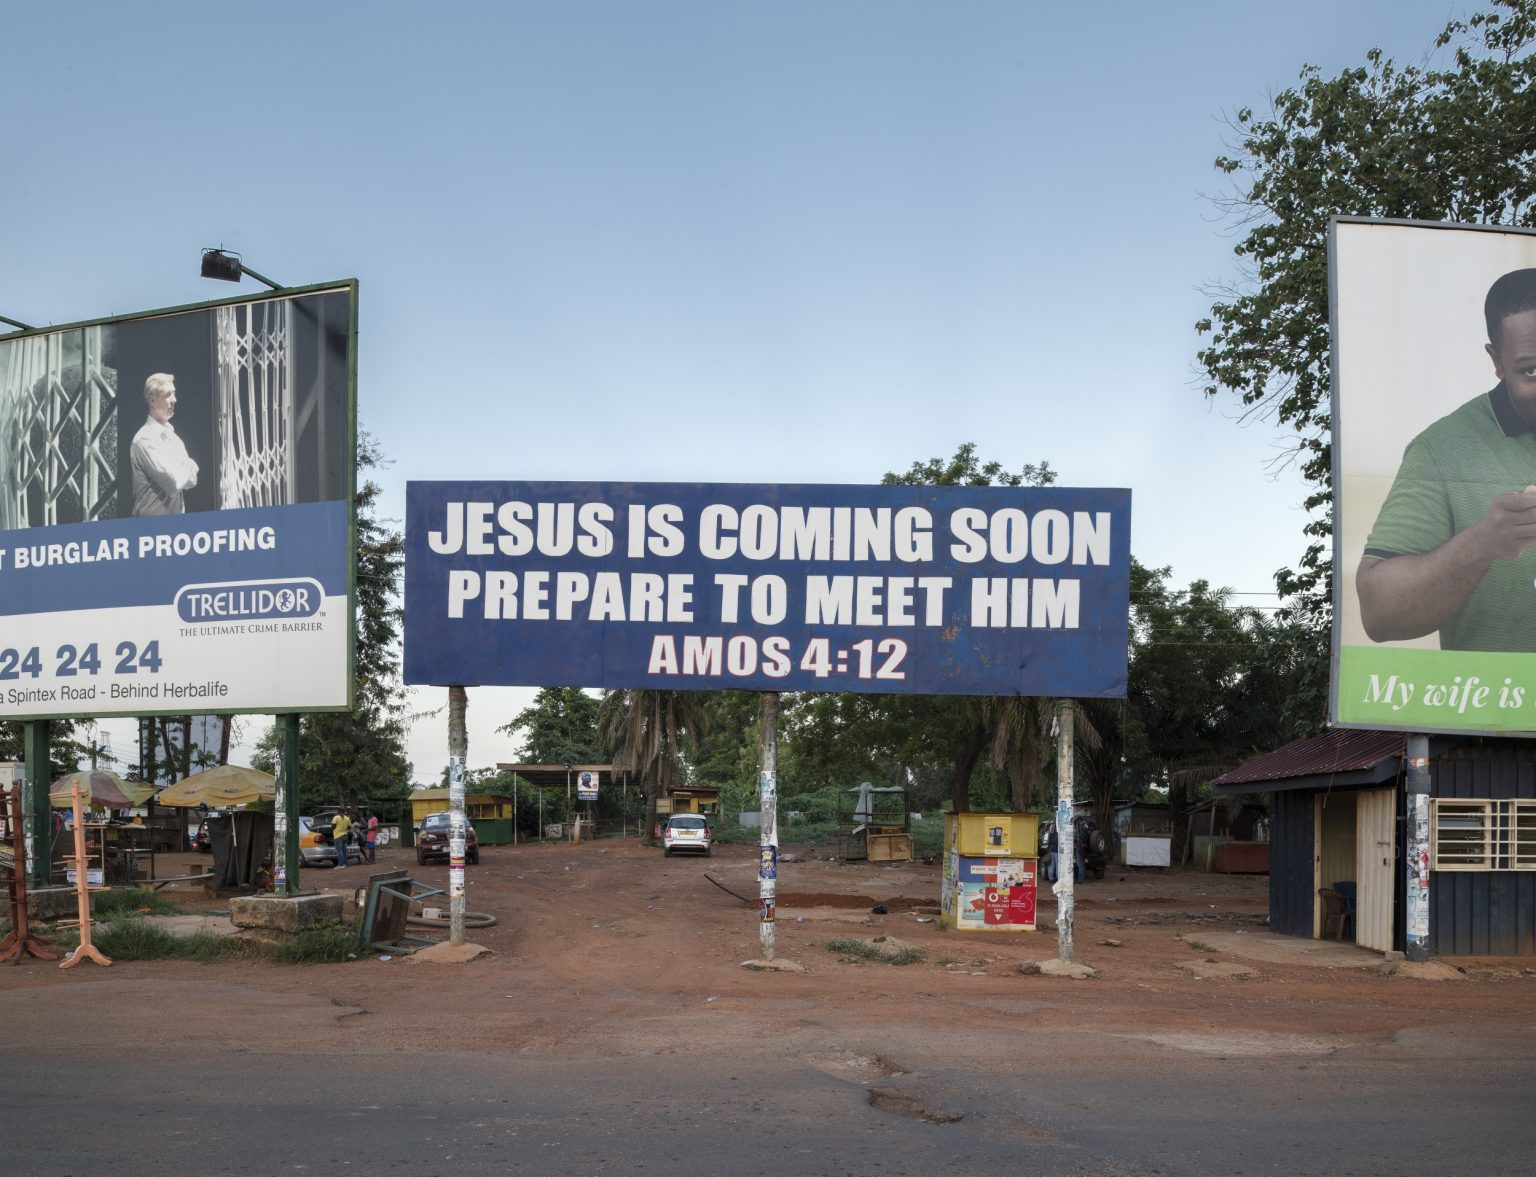 Billdoard on a street of the city. Kumasi, Ashanti Region, Republic of Ghana, 2019